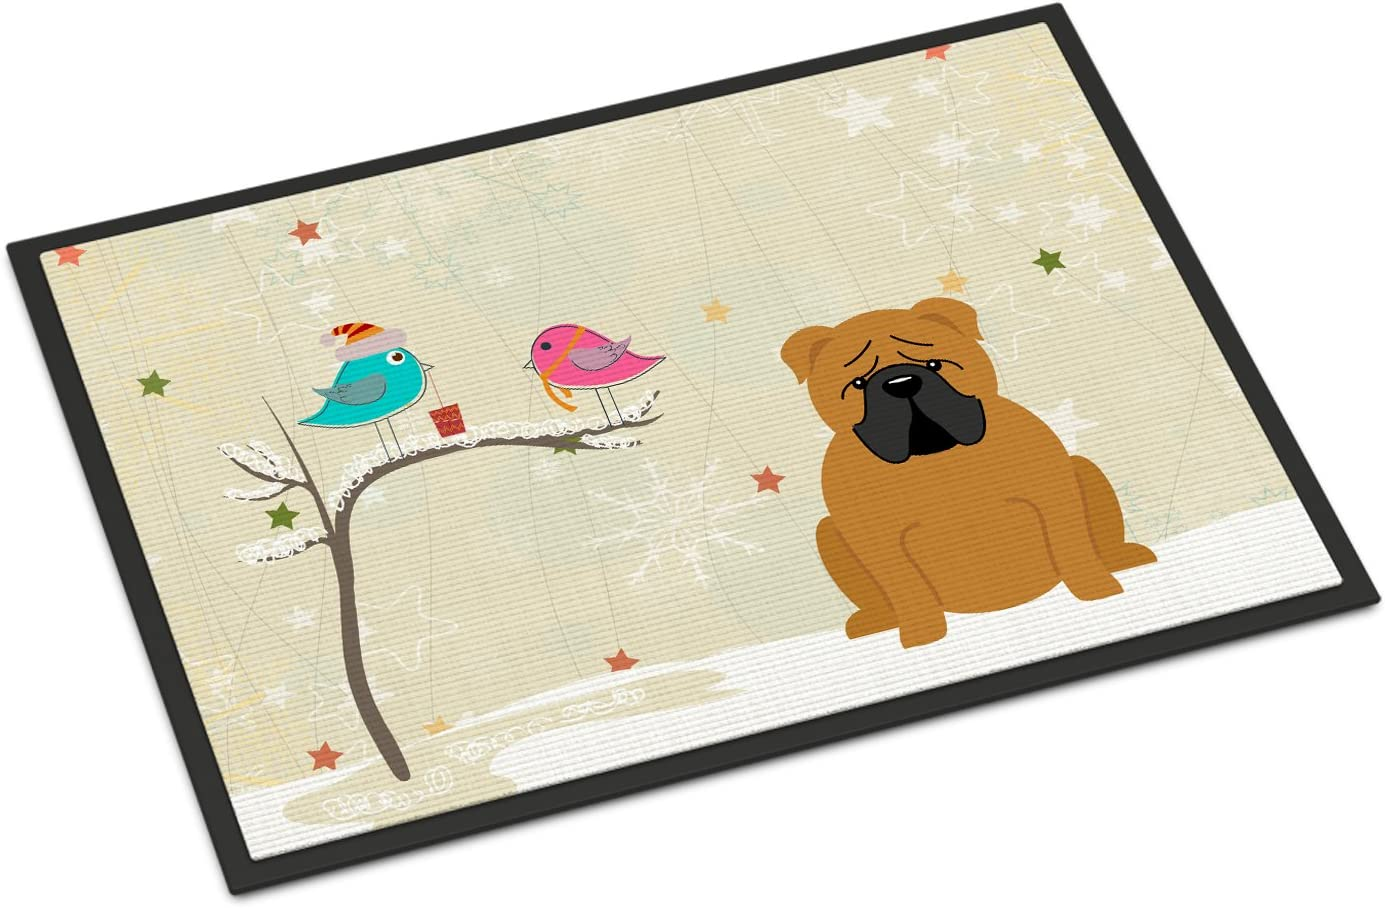 Carolines Treasures Christmas Carolers Manchester Terrier Floor Mat 19 x 27 Multicolor